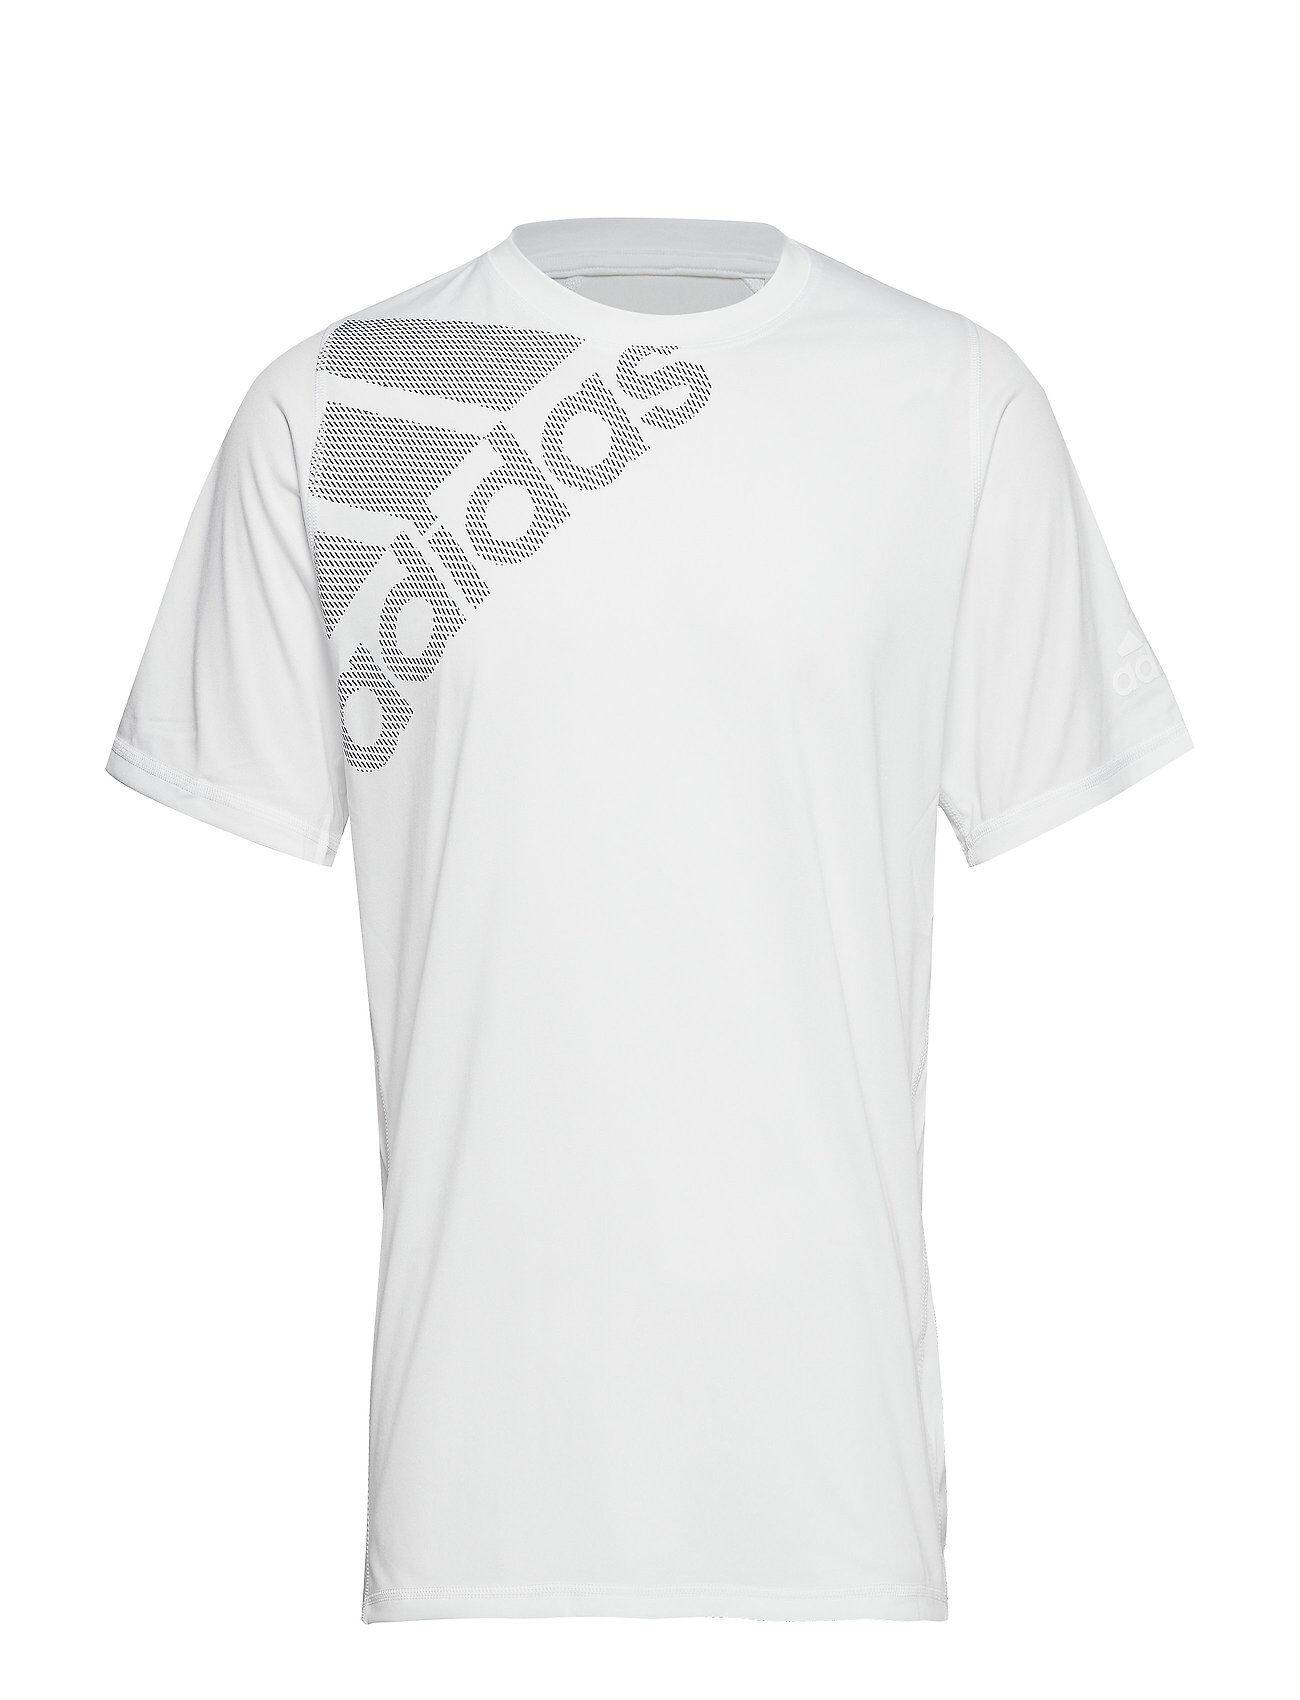 Image of adidas Performance Fl_spr Gf Bos T-shirts Short-sleeved Valkoinen Adidas Performance